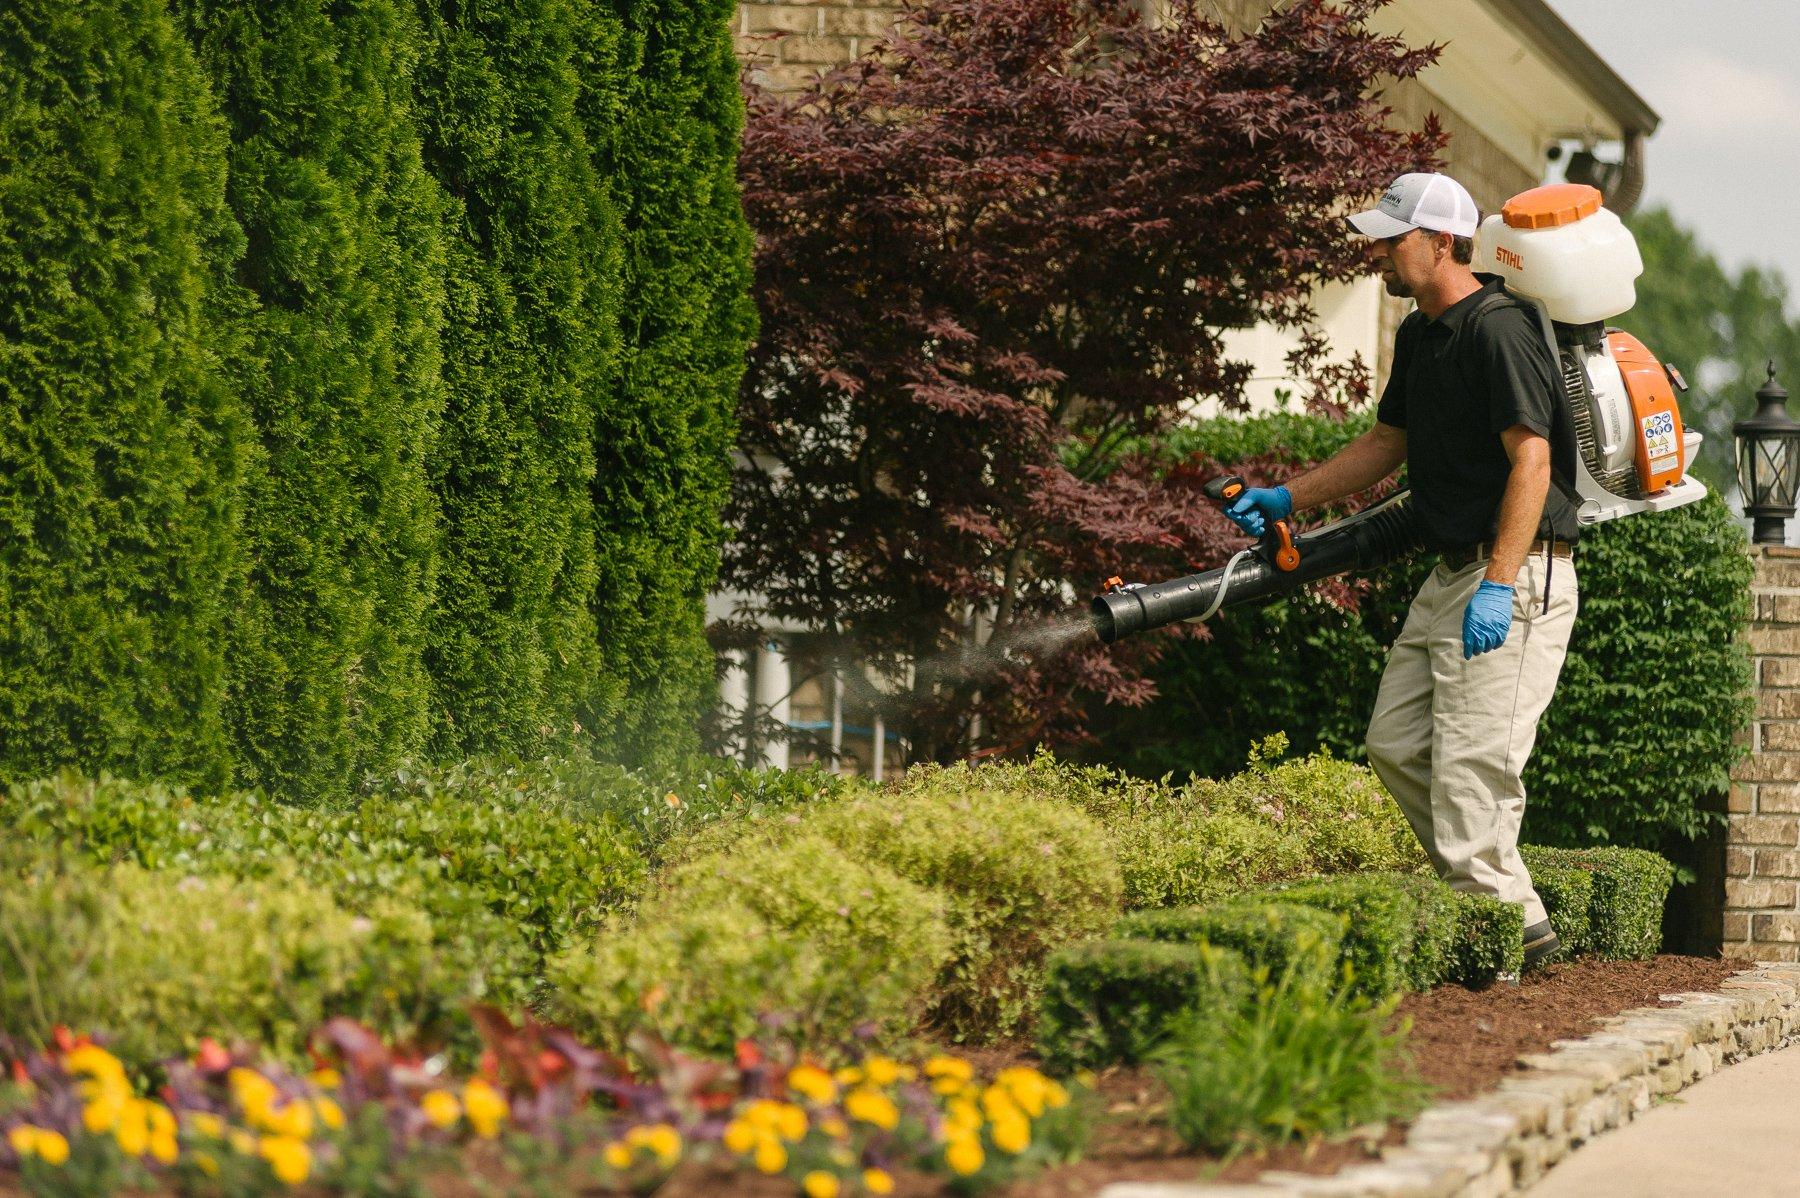 technician spraying organic mosquito spray